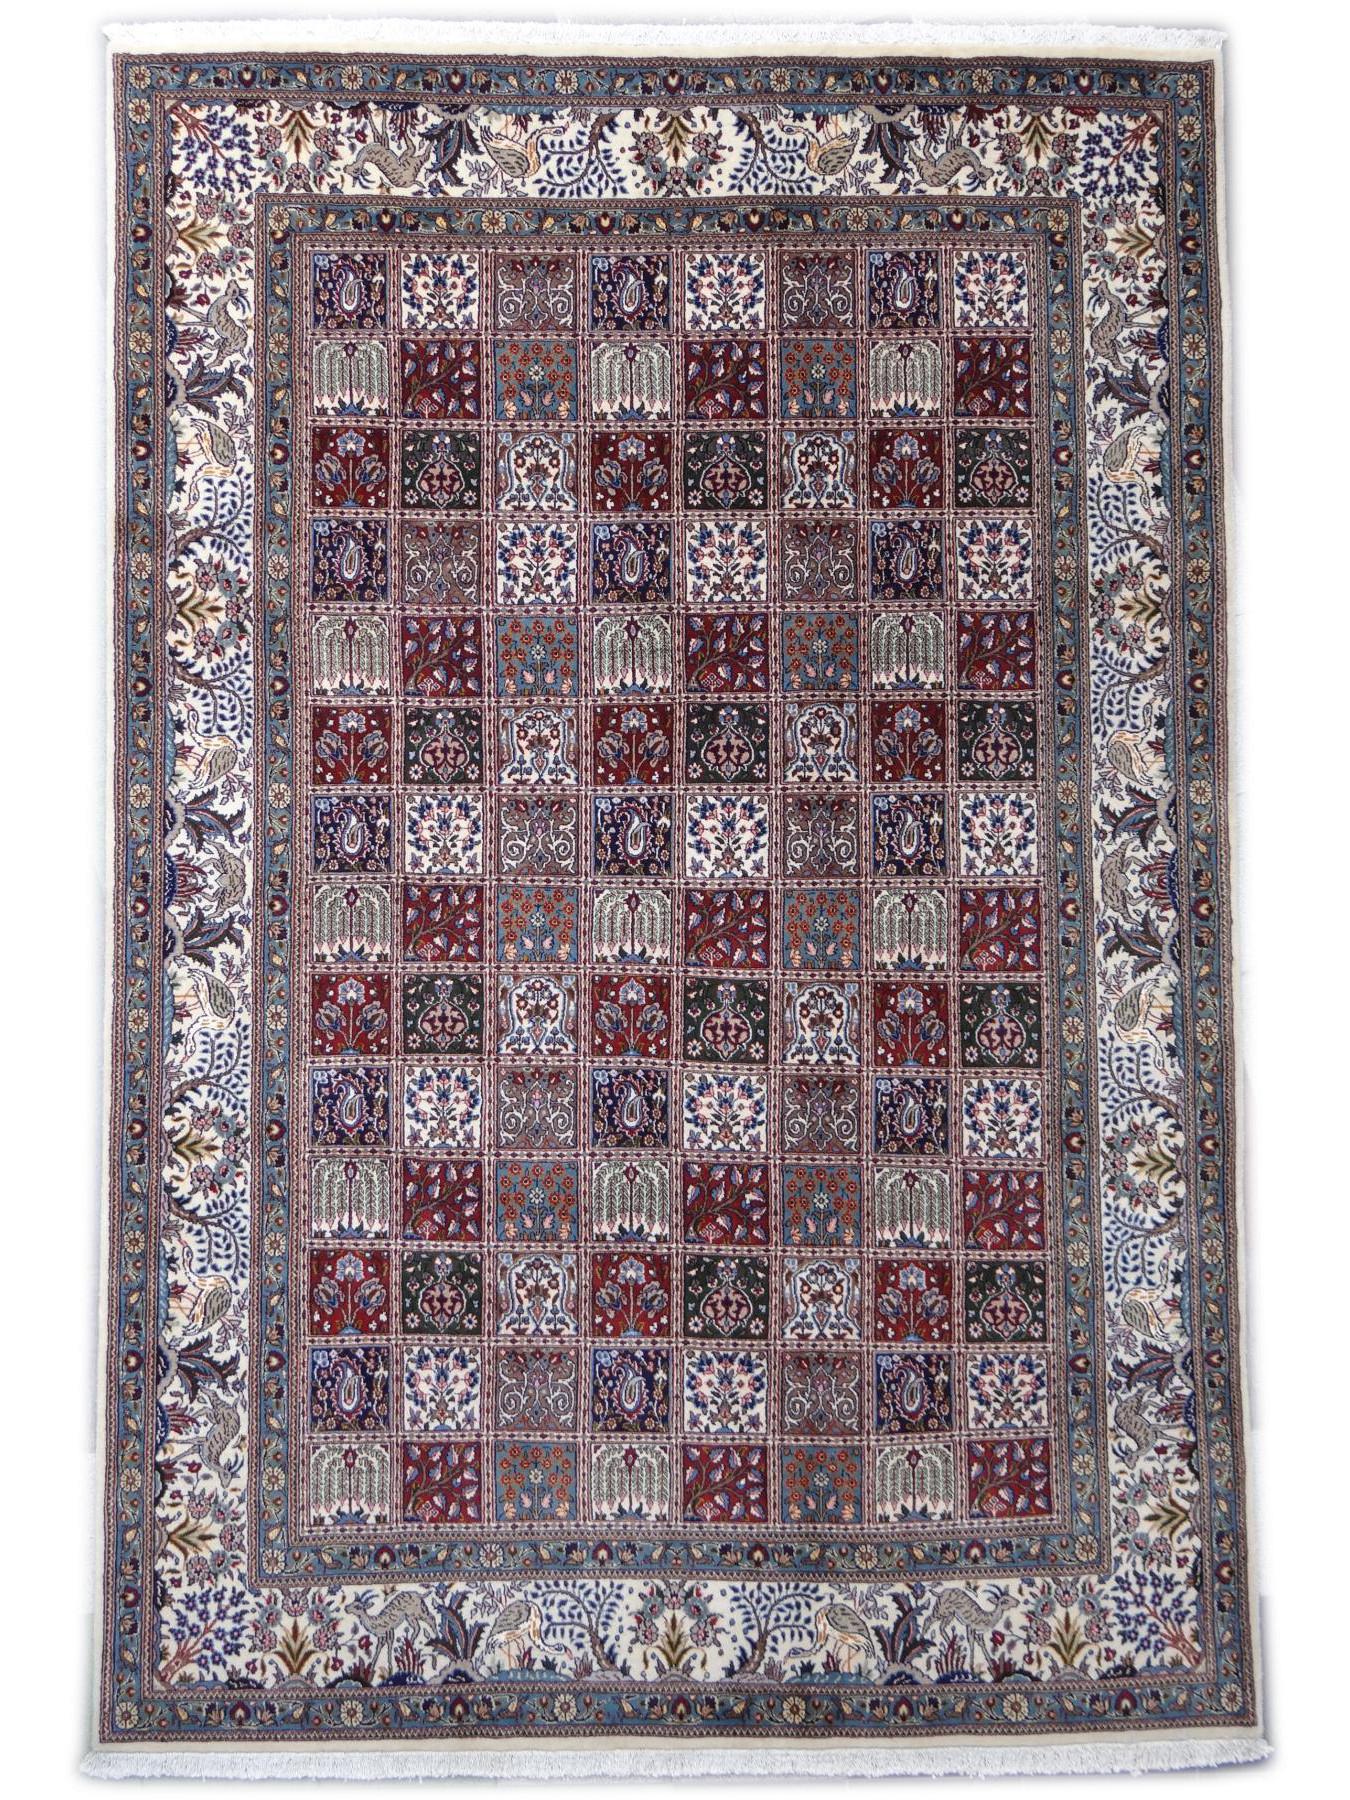 moud jardin tapis persans n 2572 298x200cm. Black Bedroom Furniture Sets. Home Design Ideas